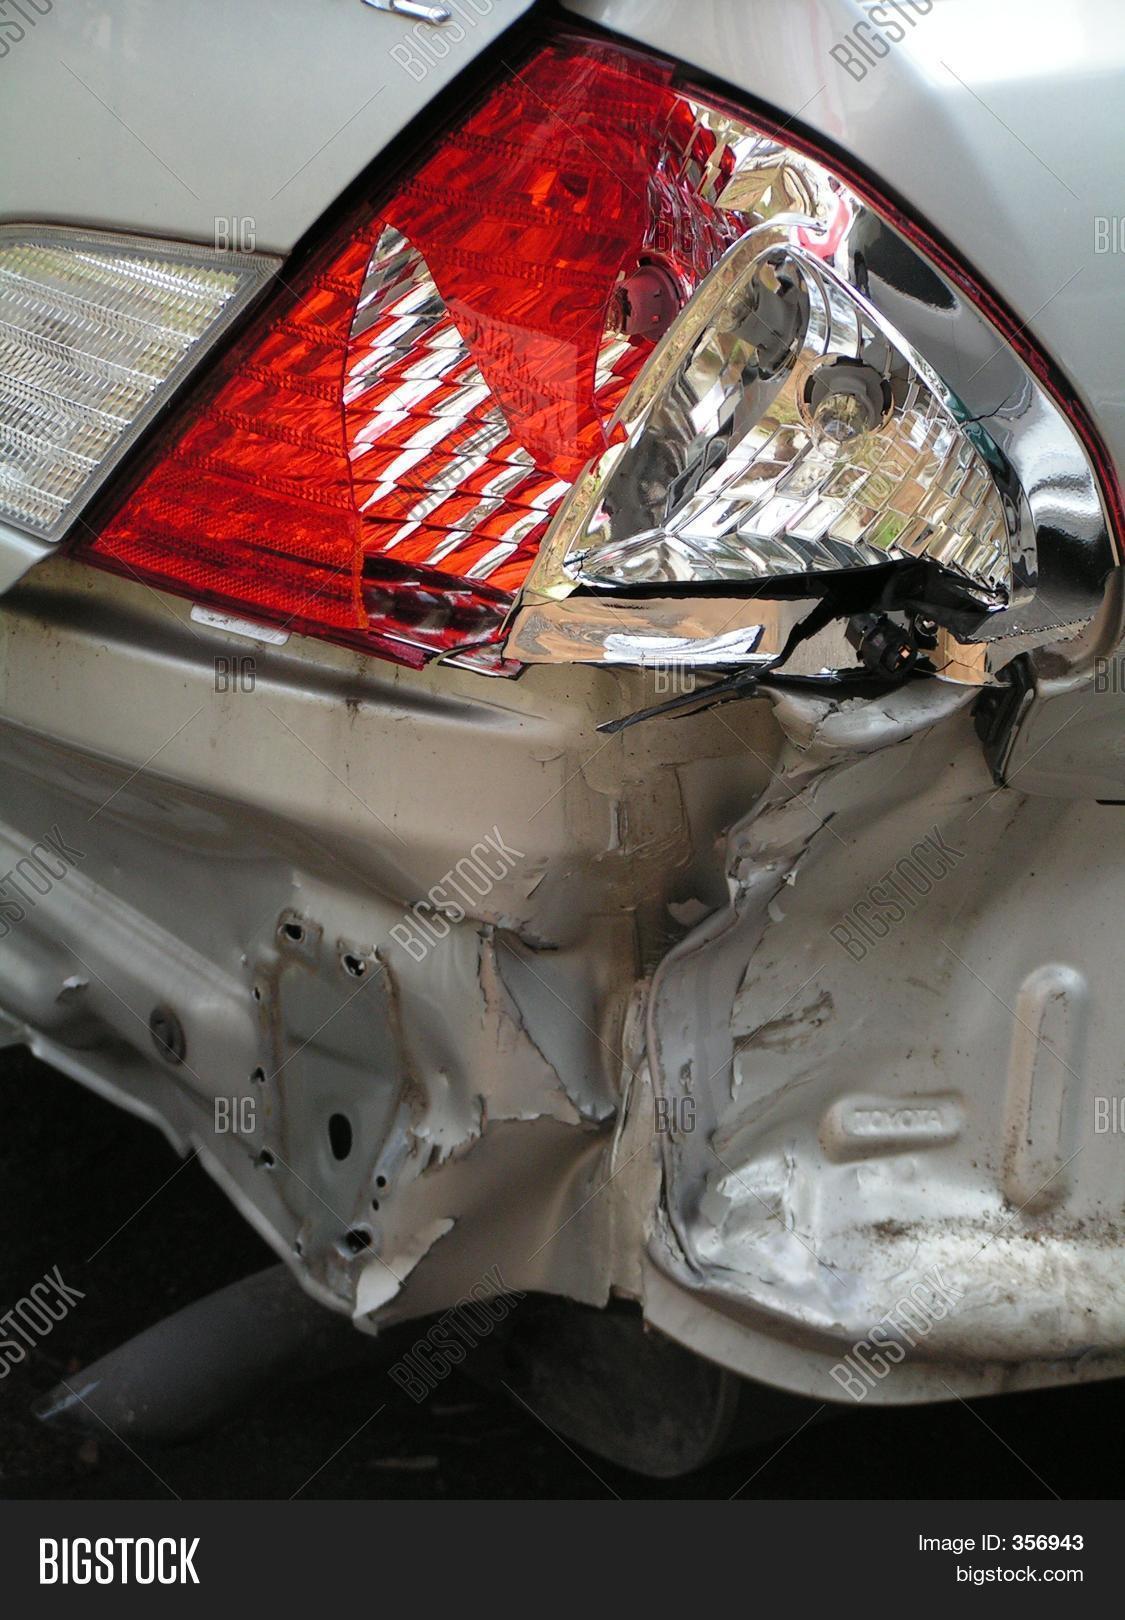 Automobile Accident Image & Photo (Free Trial) | Bigstock